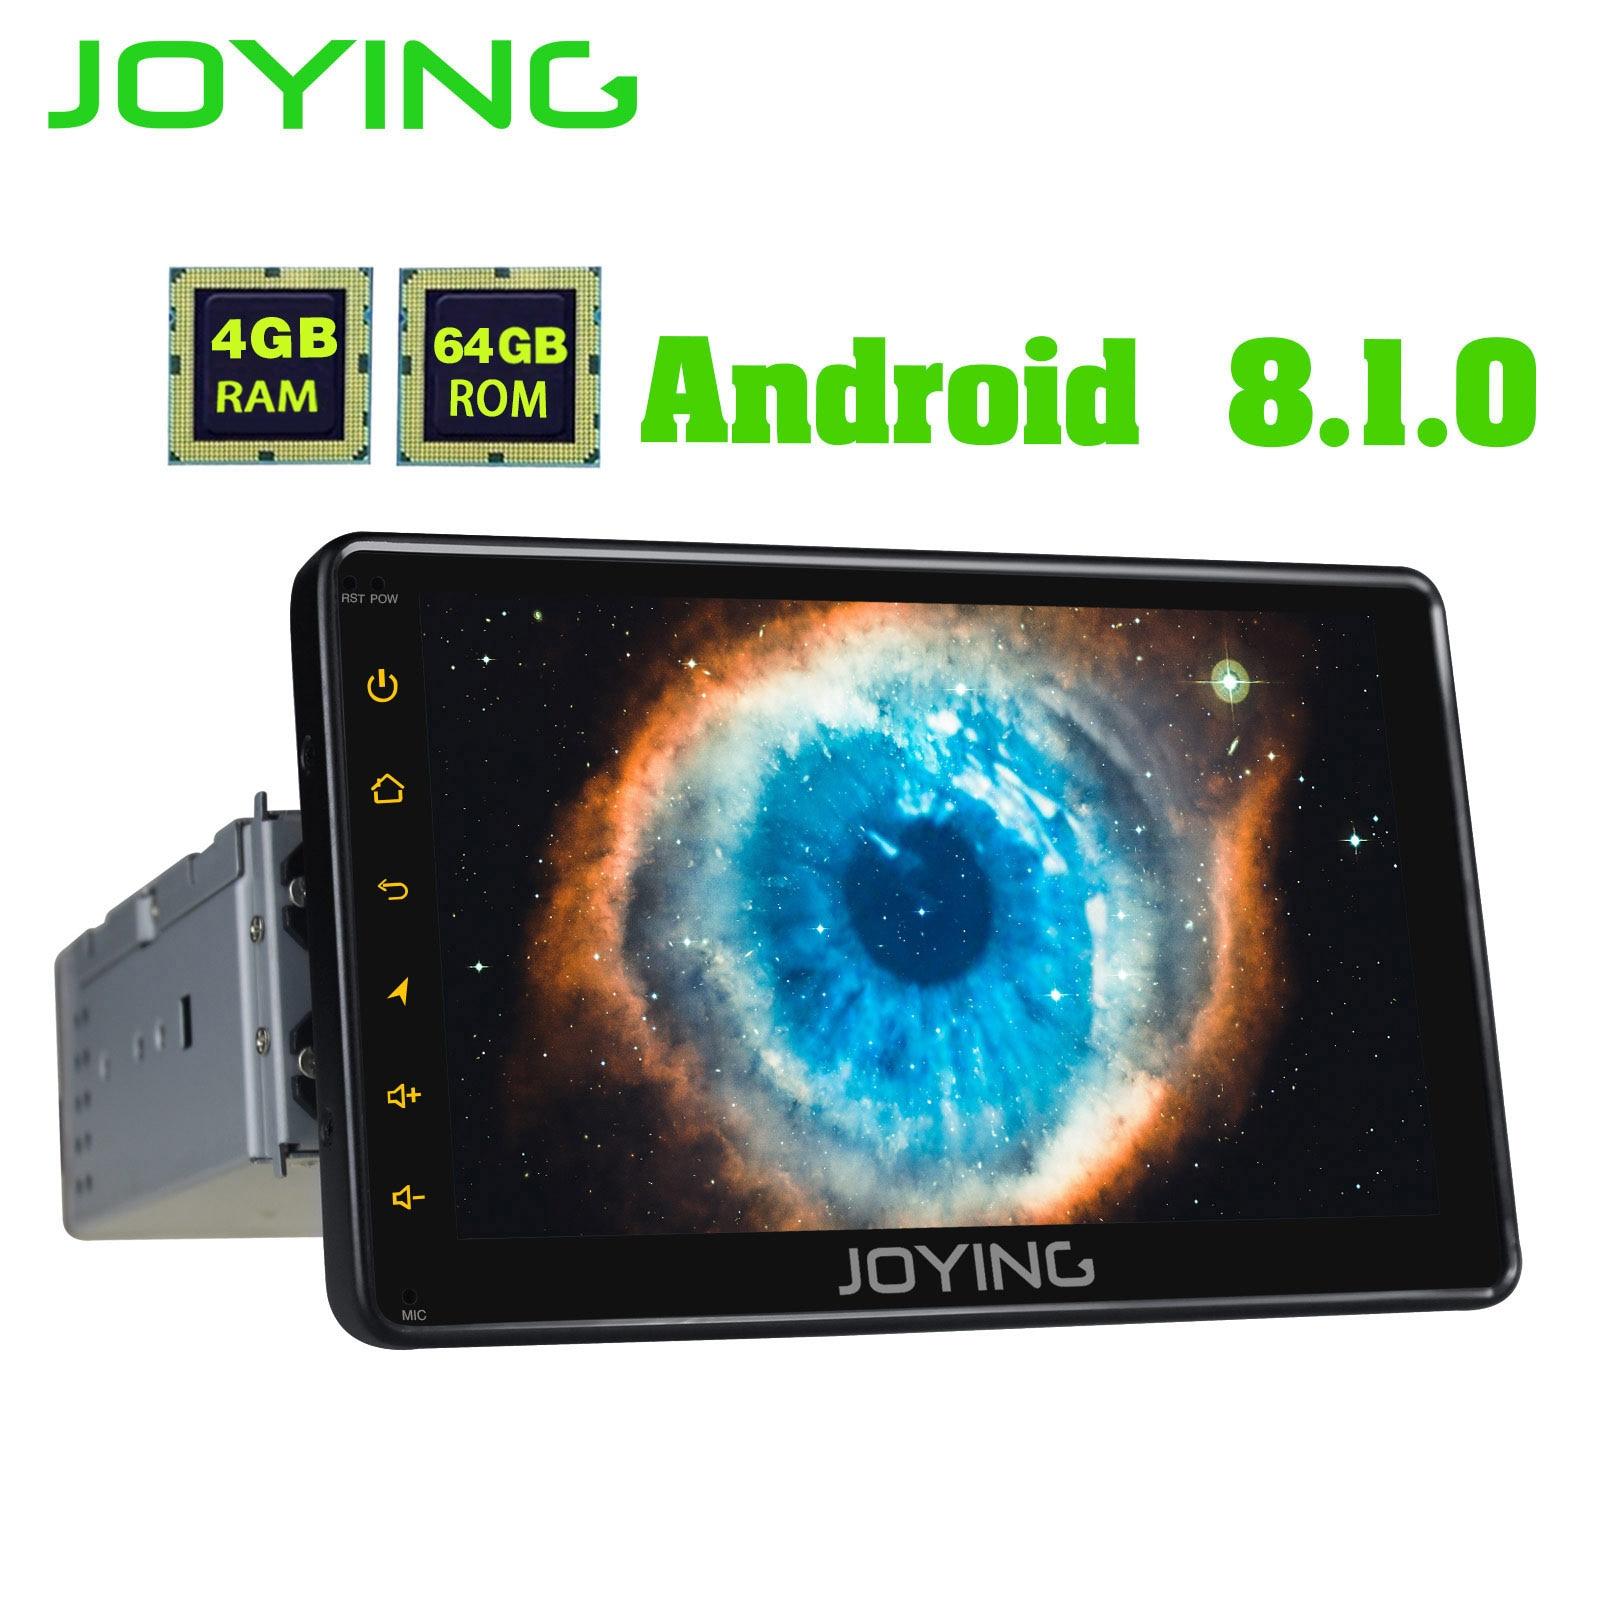 "JOYING 1 Din Android 8.1 Car Radio Octa Core GPS Navi Autoradio Stereo Support 4G/fast Boot/Carplay/SWC 4GB+64GB 7"" HD Display"